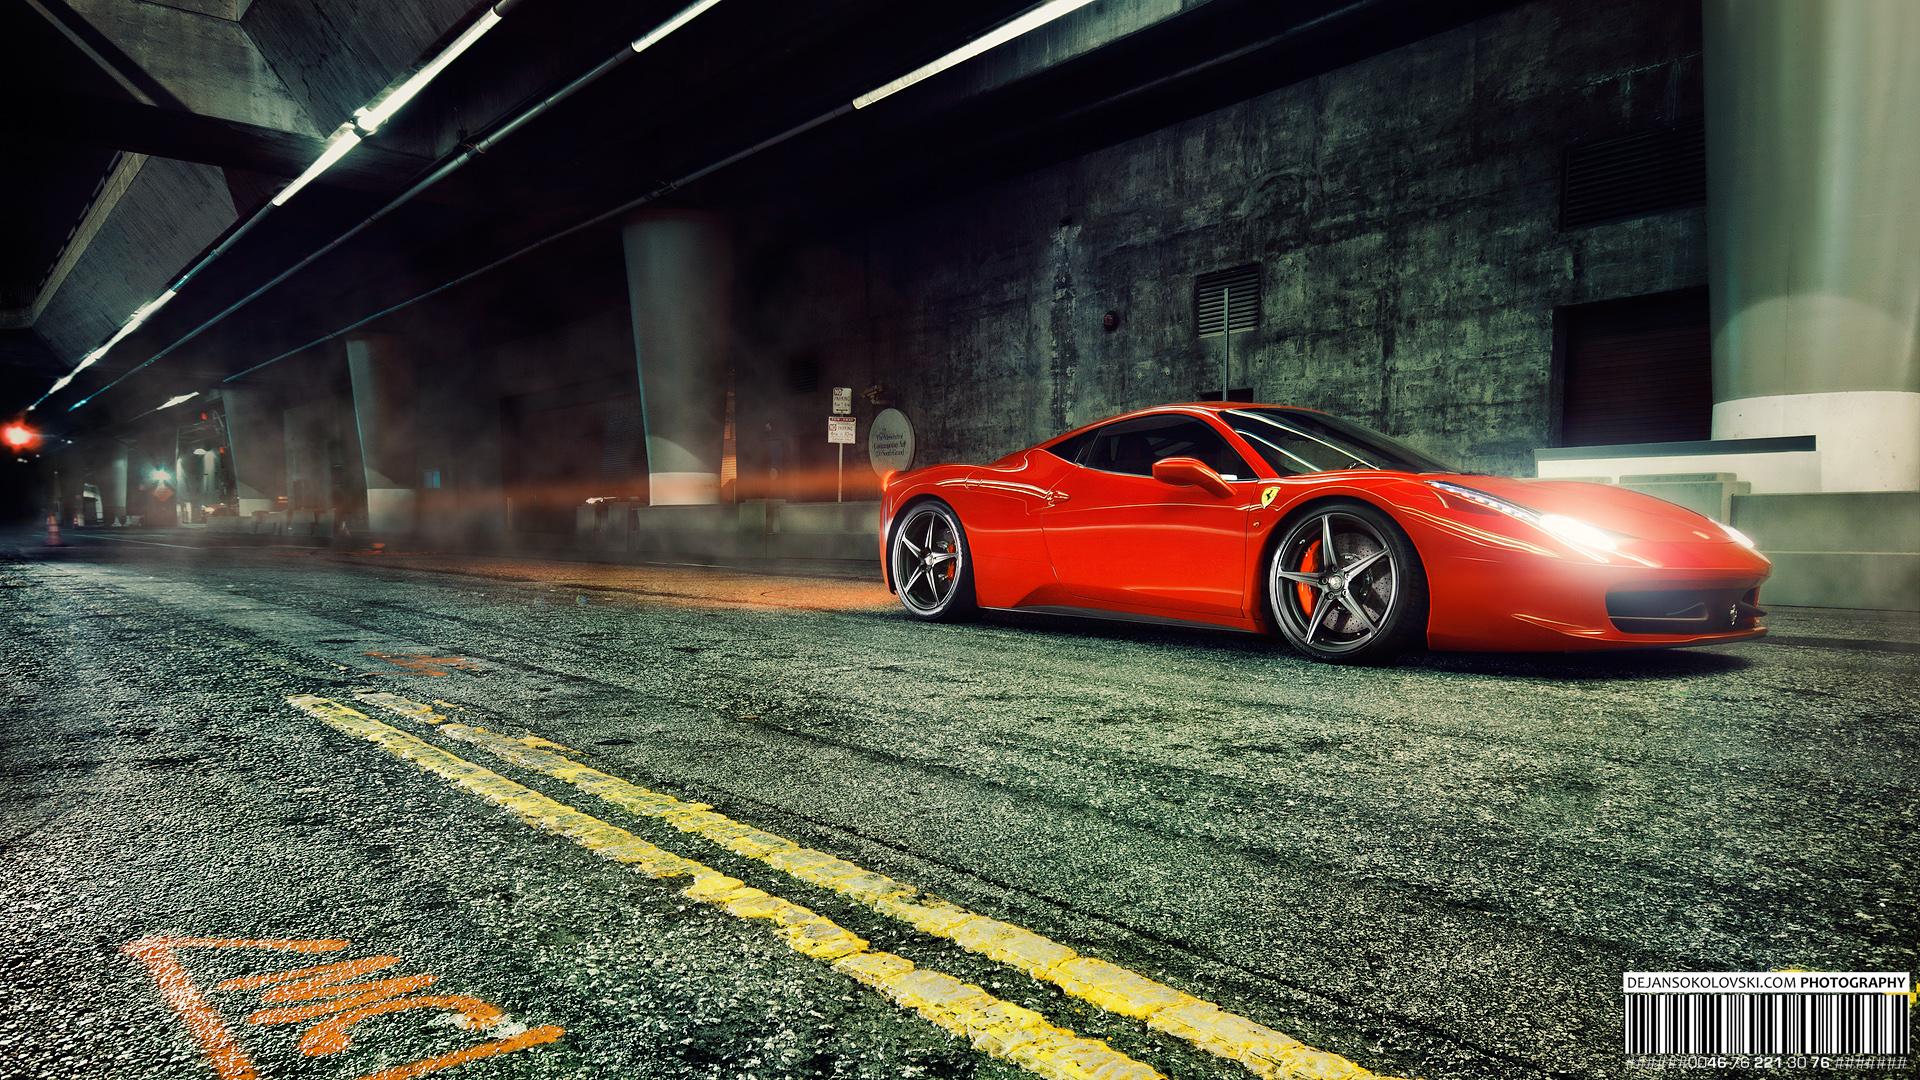 Ferrari 458 Italia Wallpapers HD Wallpapers 1920x1080